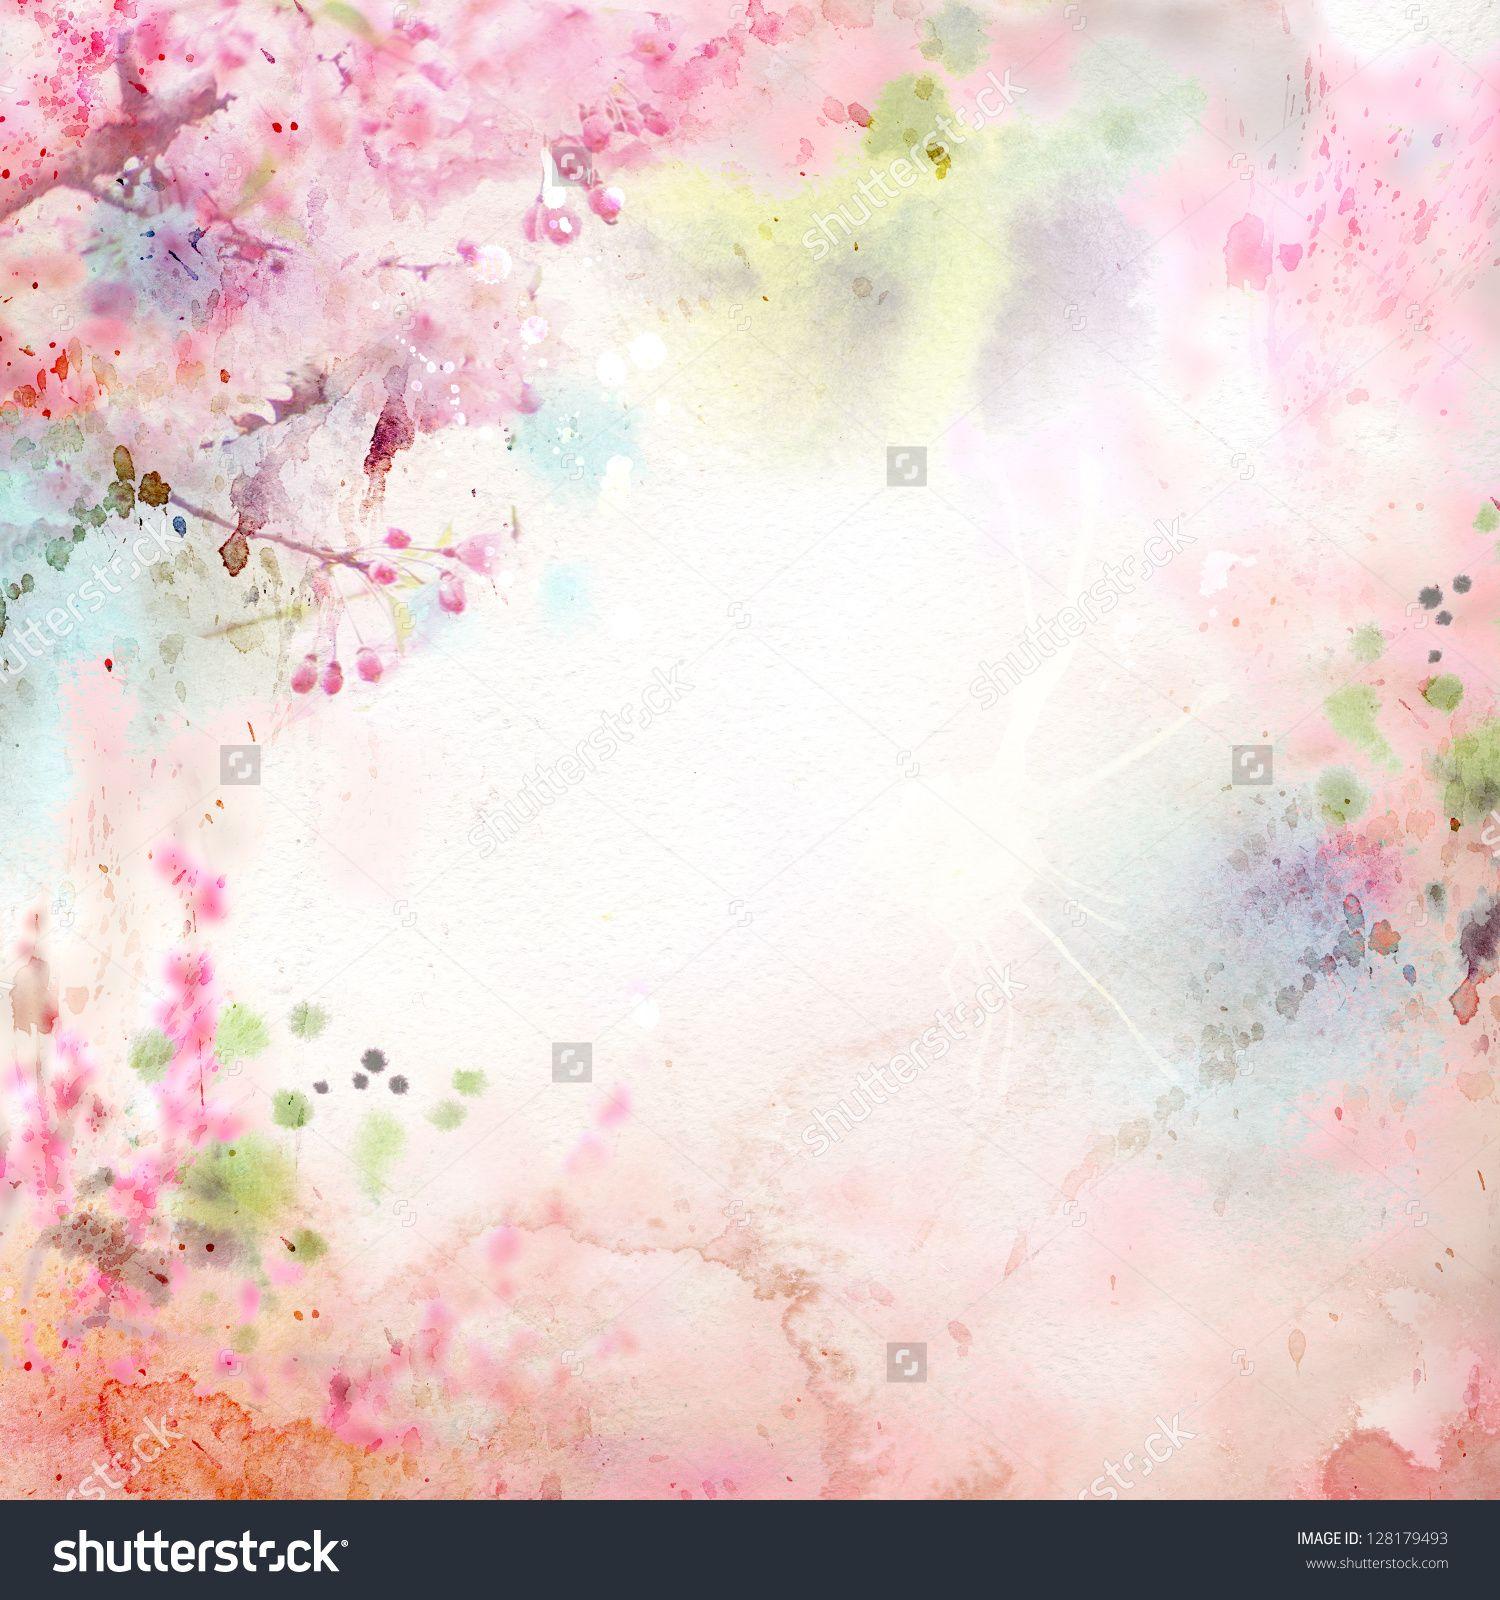 Scenic Watercolor Background Floral Composition Sakura